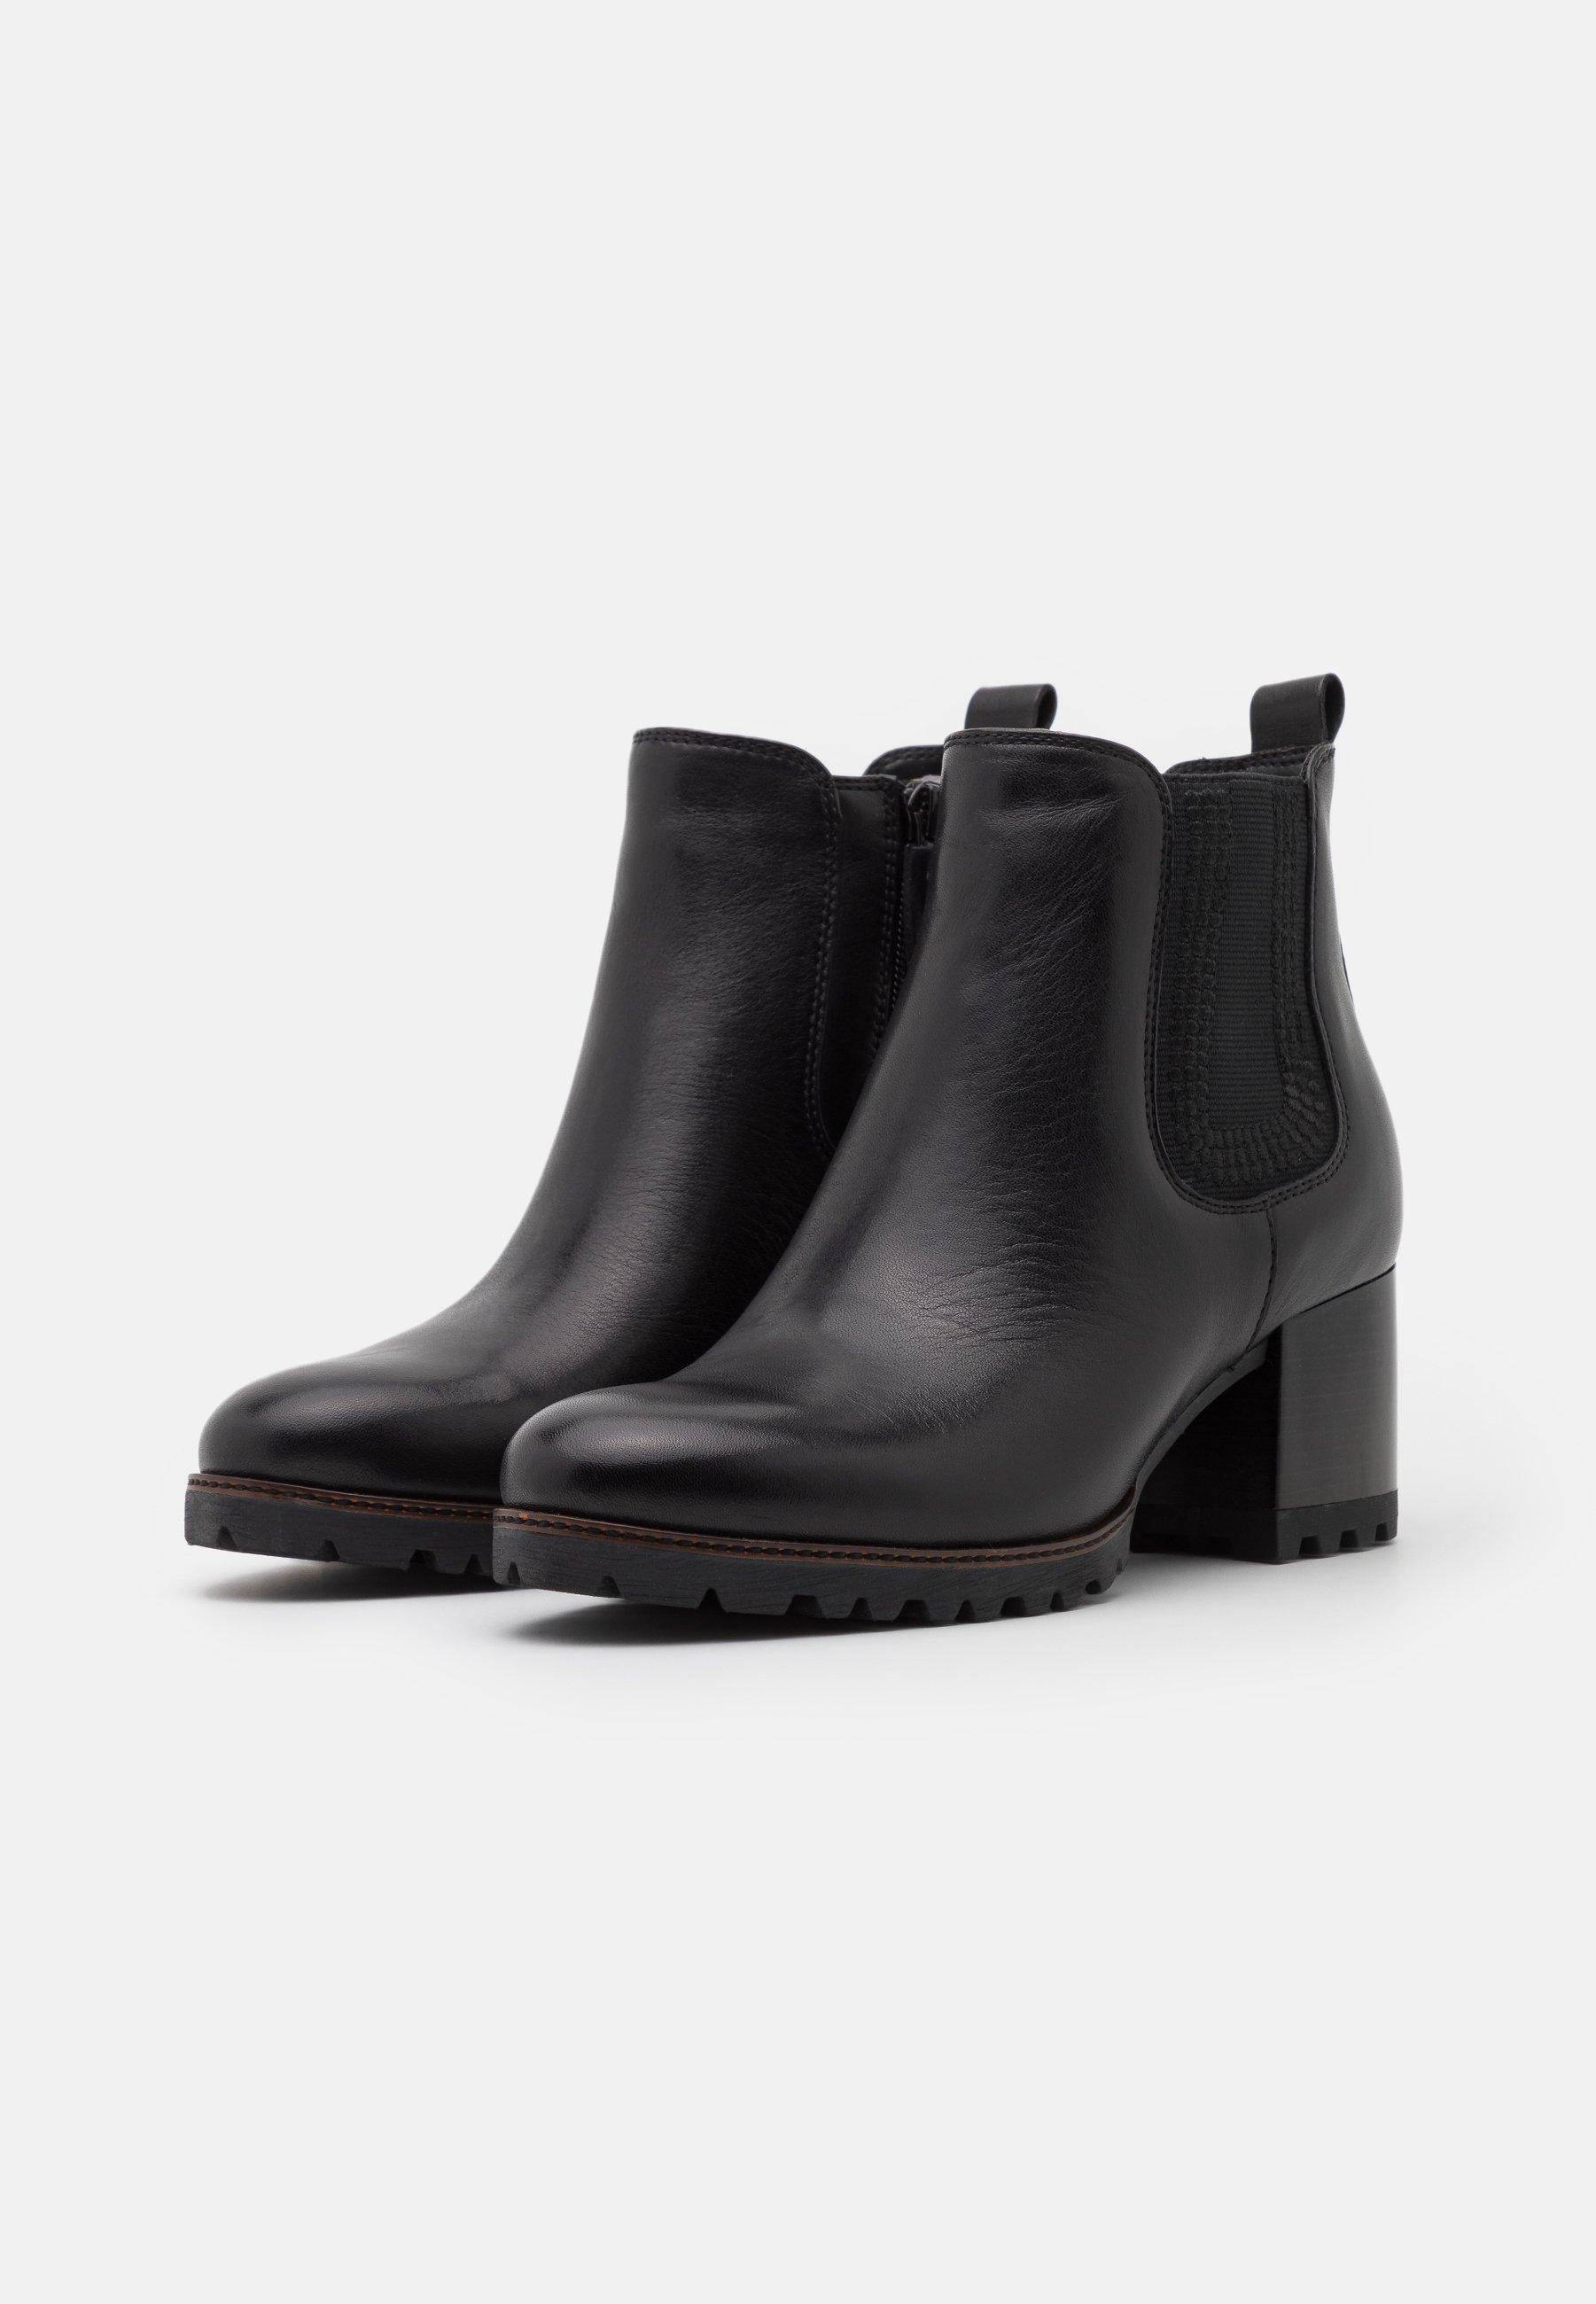 Tamaris Pure Relax Ankle Boot black/schwarz